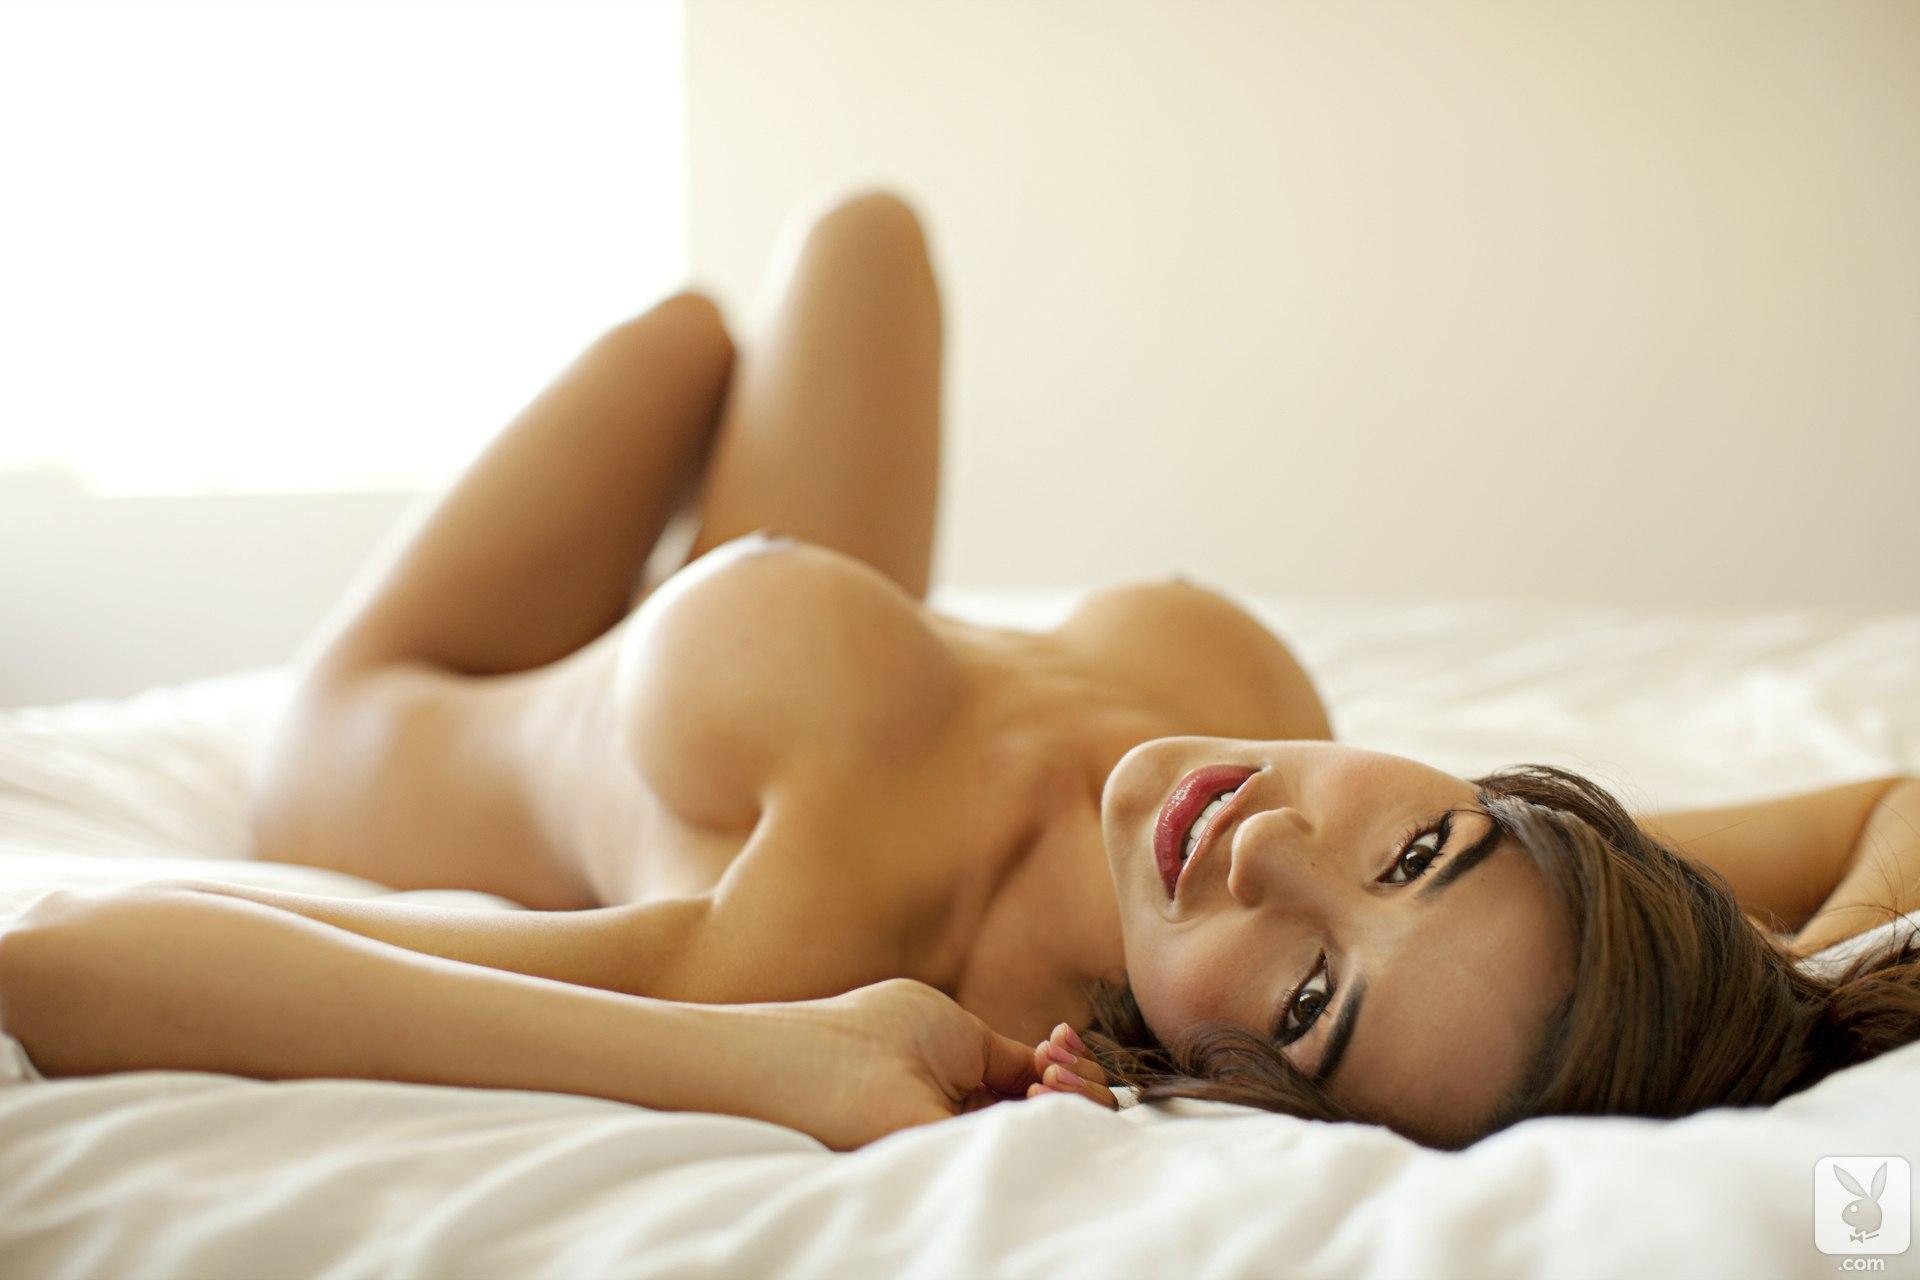 Veena malik nude photo escort in istanbul city